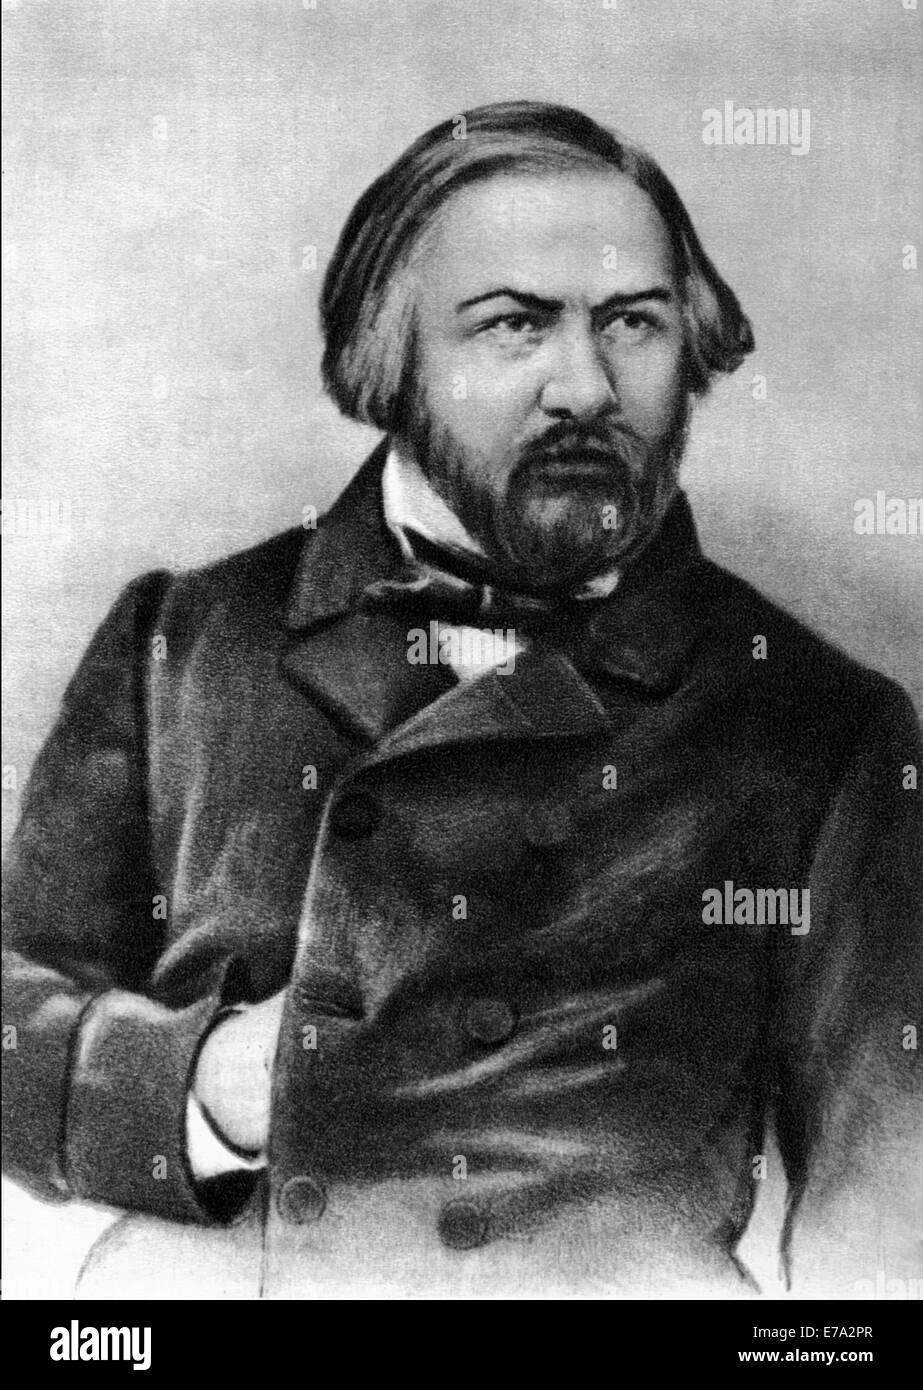 Mikhail Ivanovich Glinka: biography of the world-famous composer